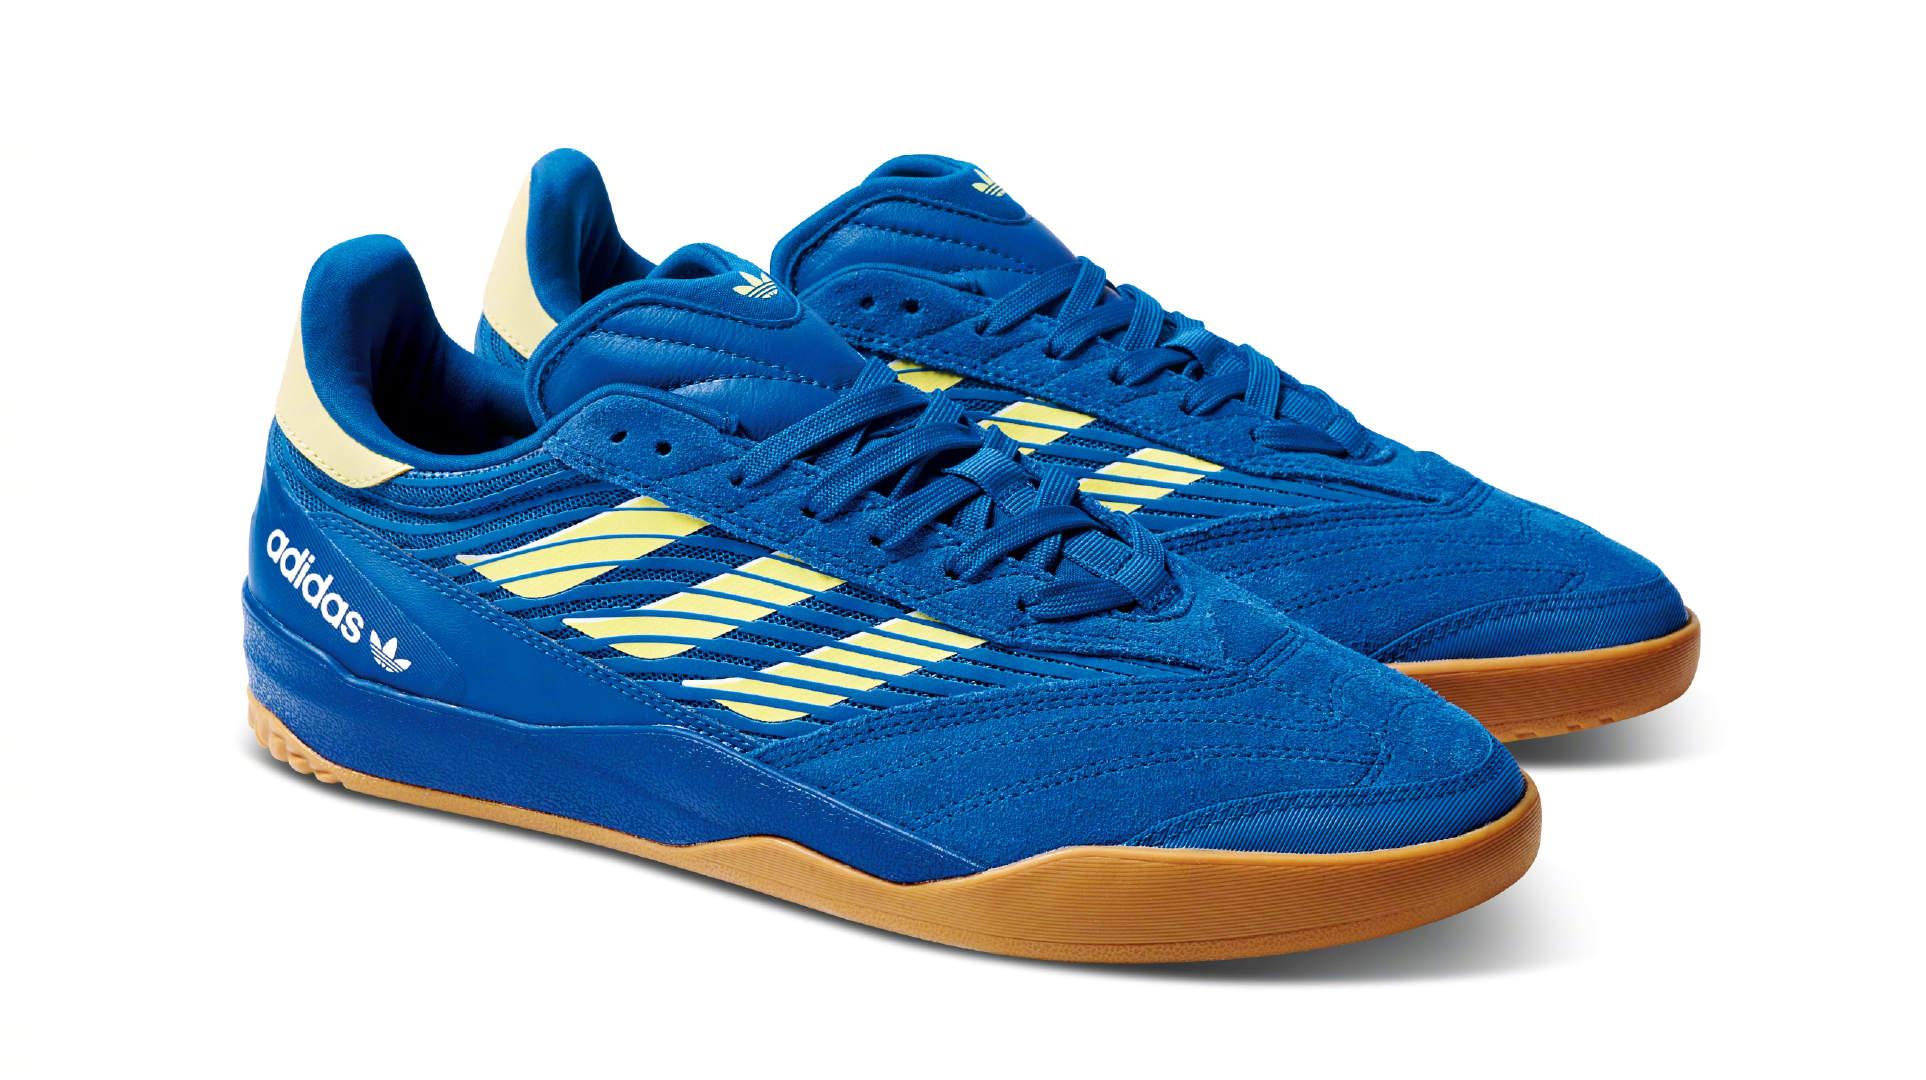 adidas Skateboarding再次借鉴足球元素推出Copa Nationale